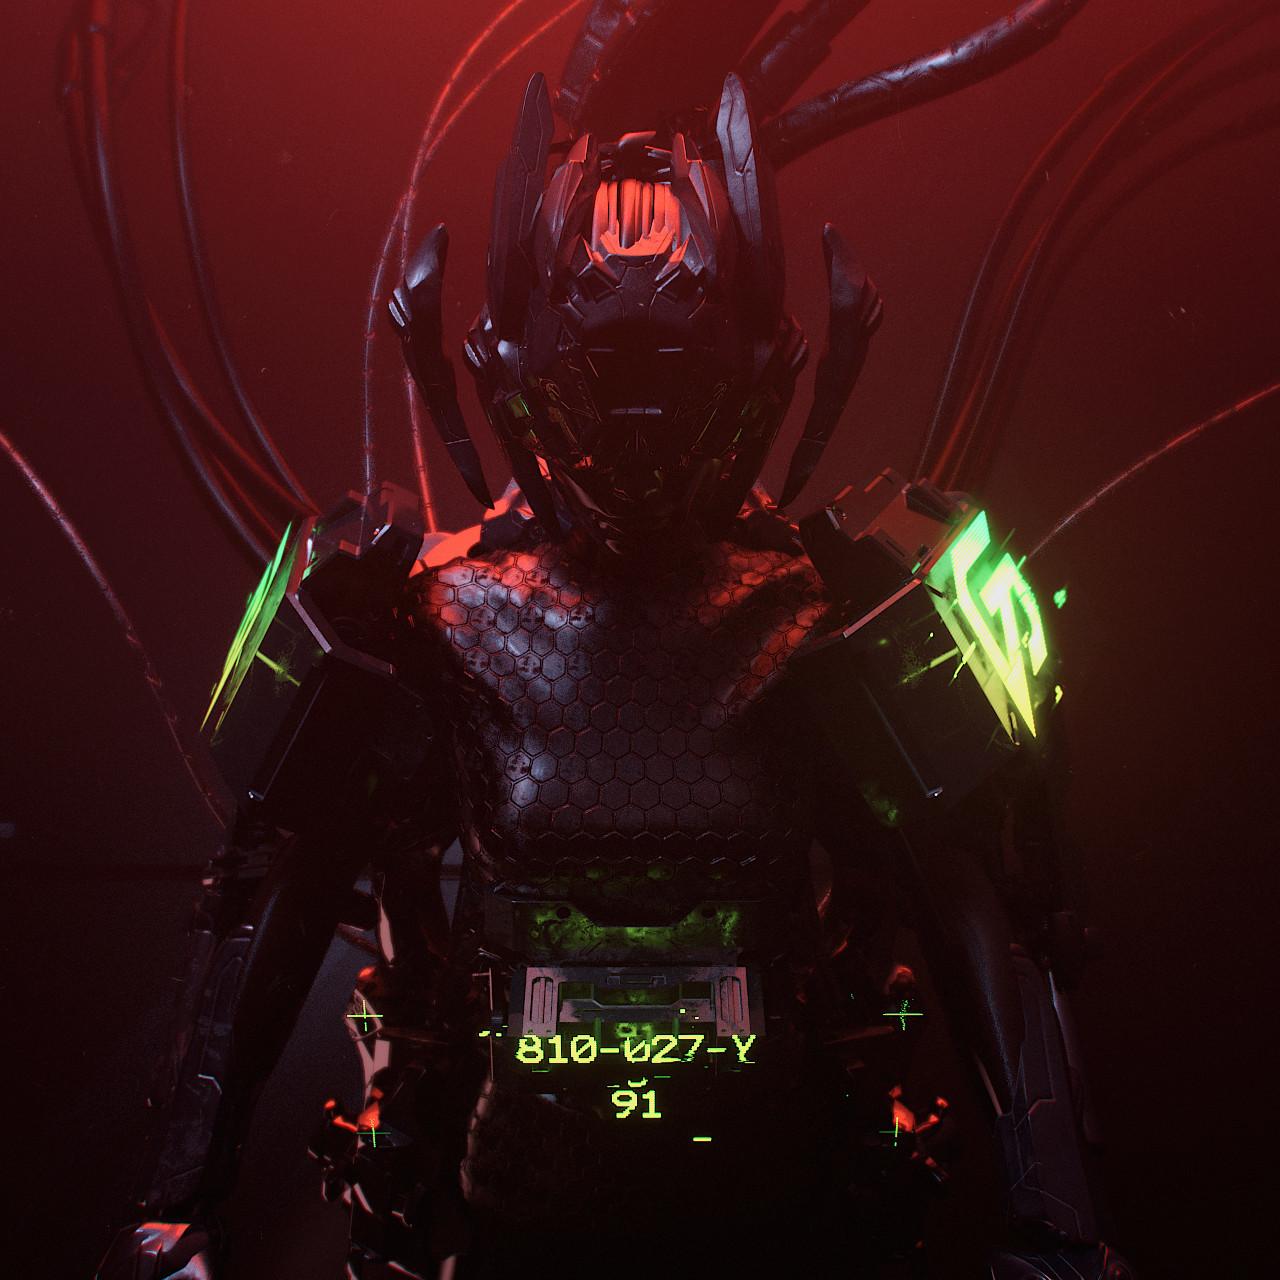 киберпанк, cyberpunk, art, арт, Gabriel Punsalang, gvokerart